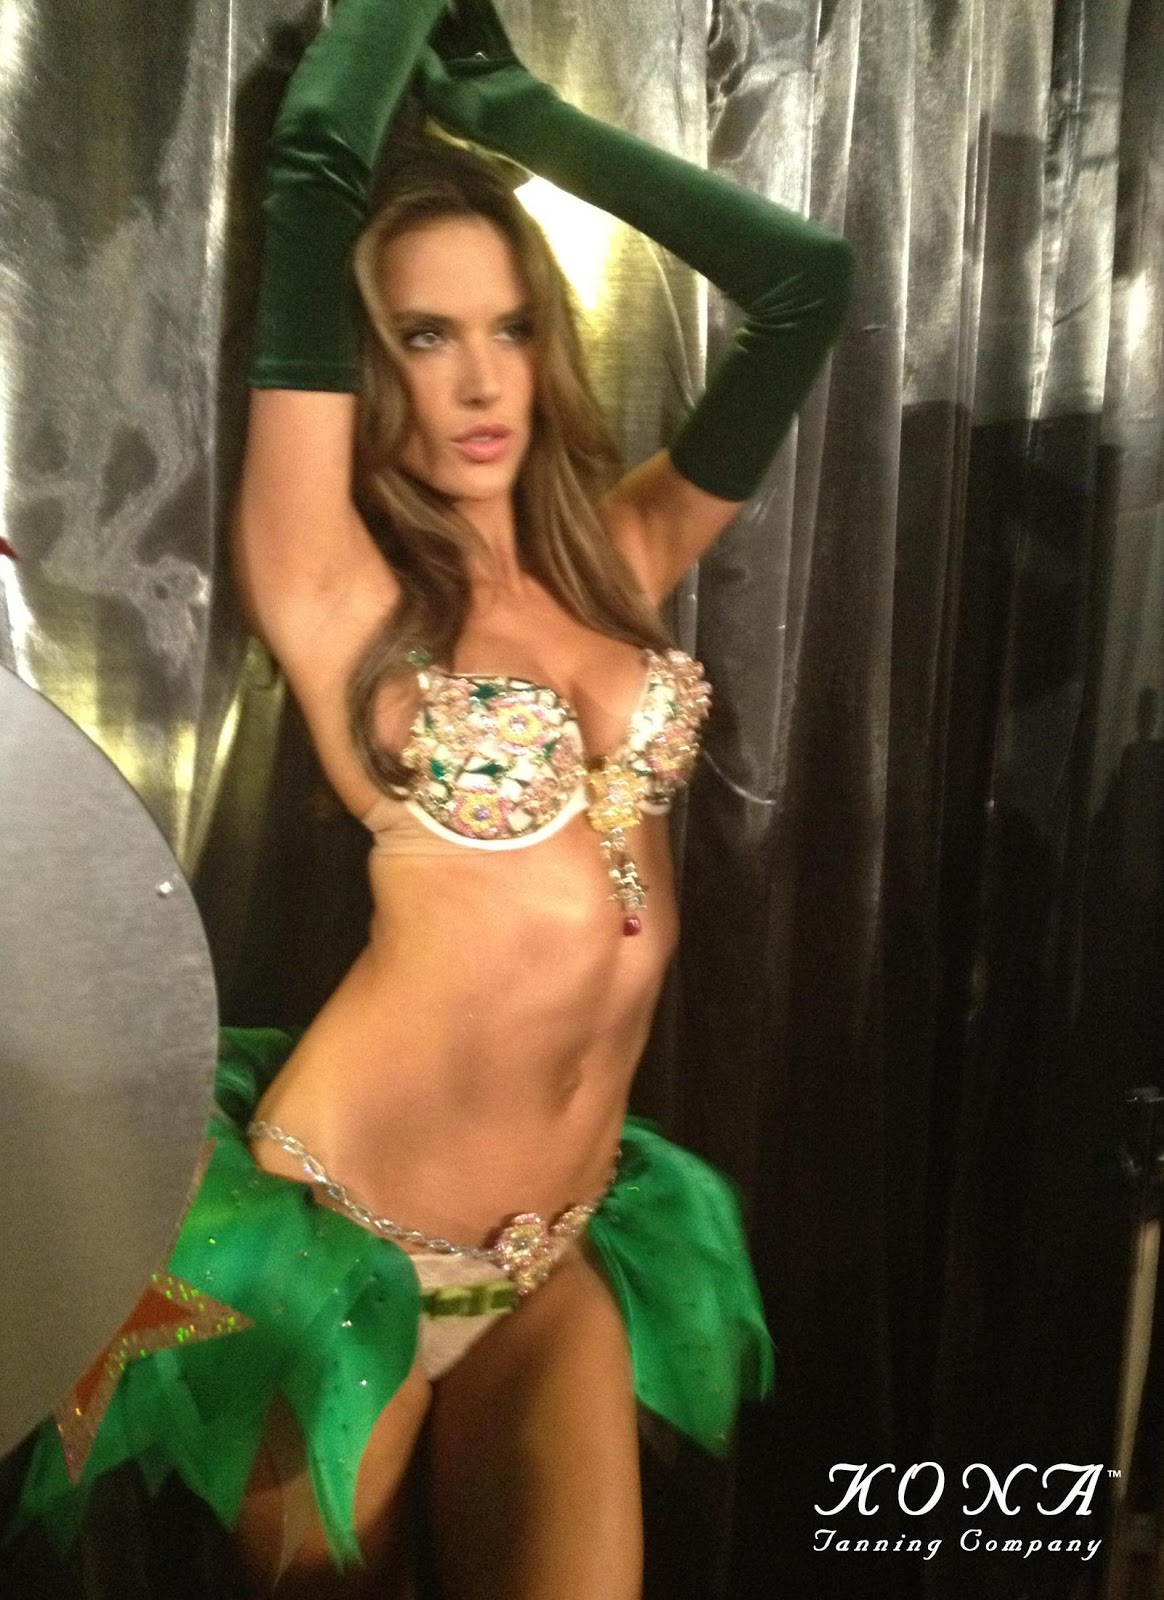 http://4.bp.blogspot.com/-TJIqmta70_0/UKKnNyoXo5I/AAAAAAAACrY/yGMyUTG7hSA/s1600/alessandra-ambrosio-fantasy-bra-victorias-secret-fashion-show-kona-tanning-katie-kenny.jpg